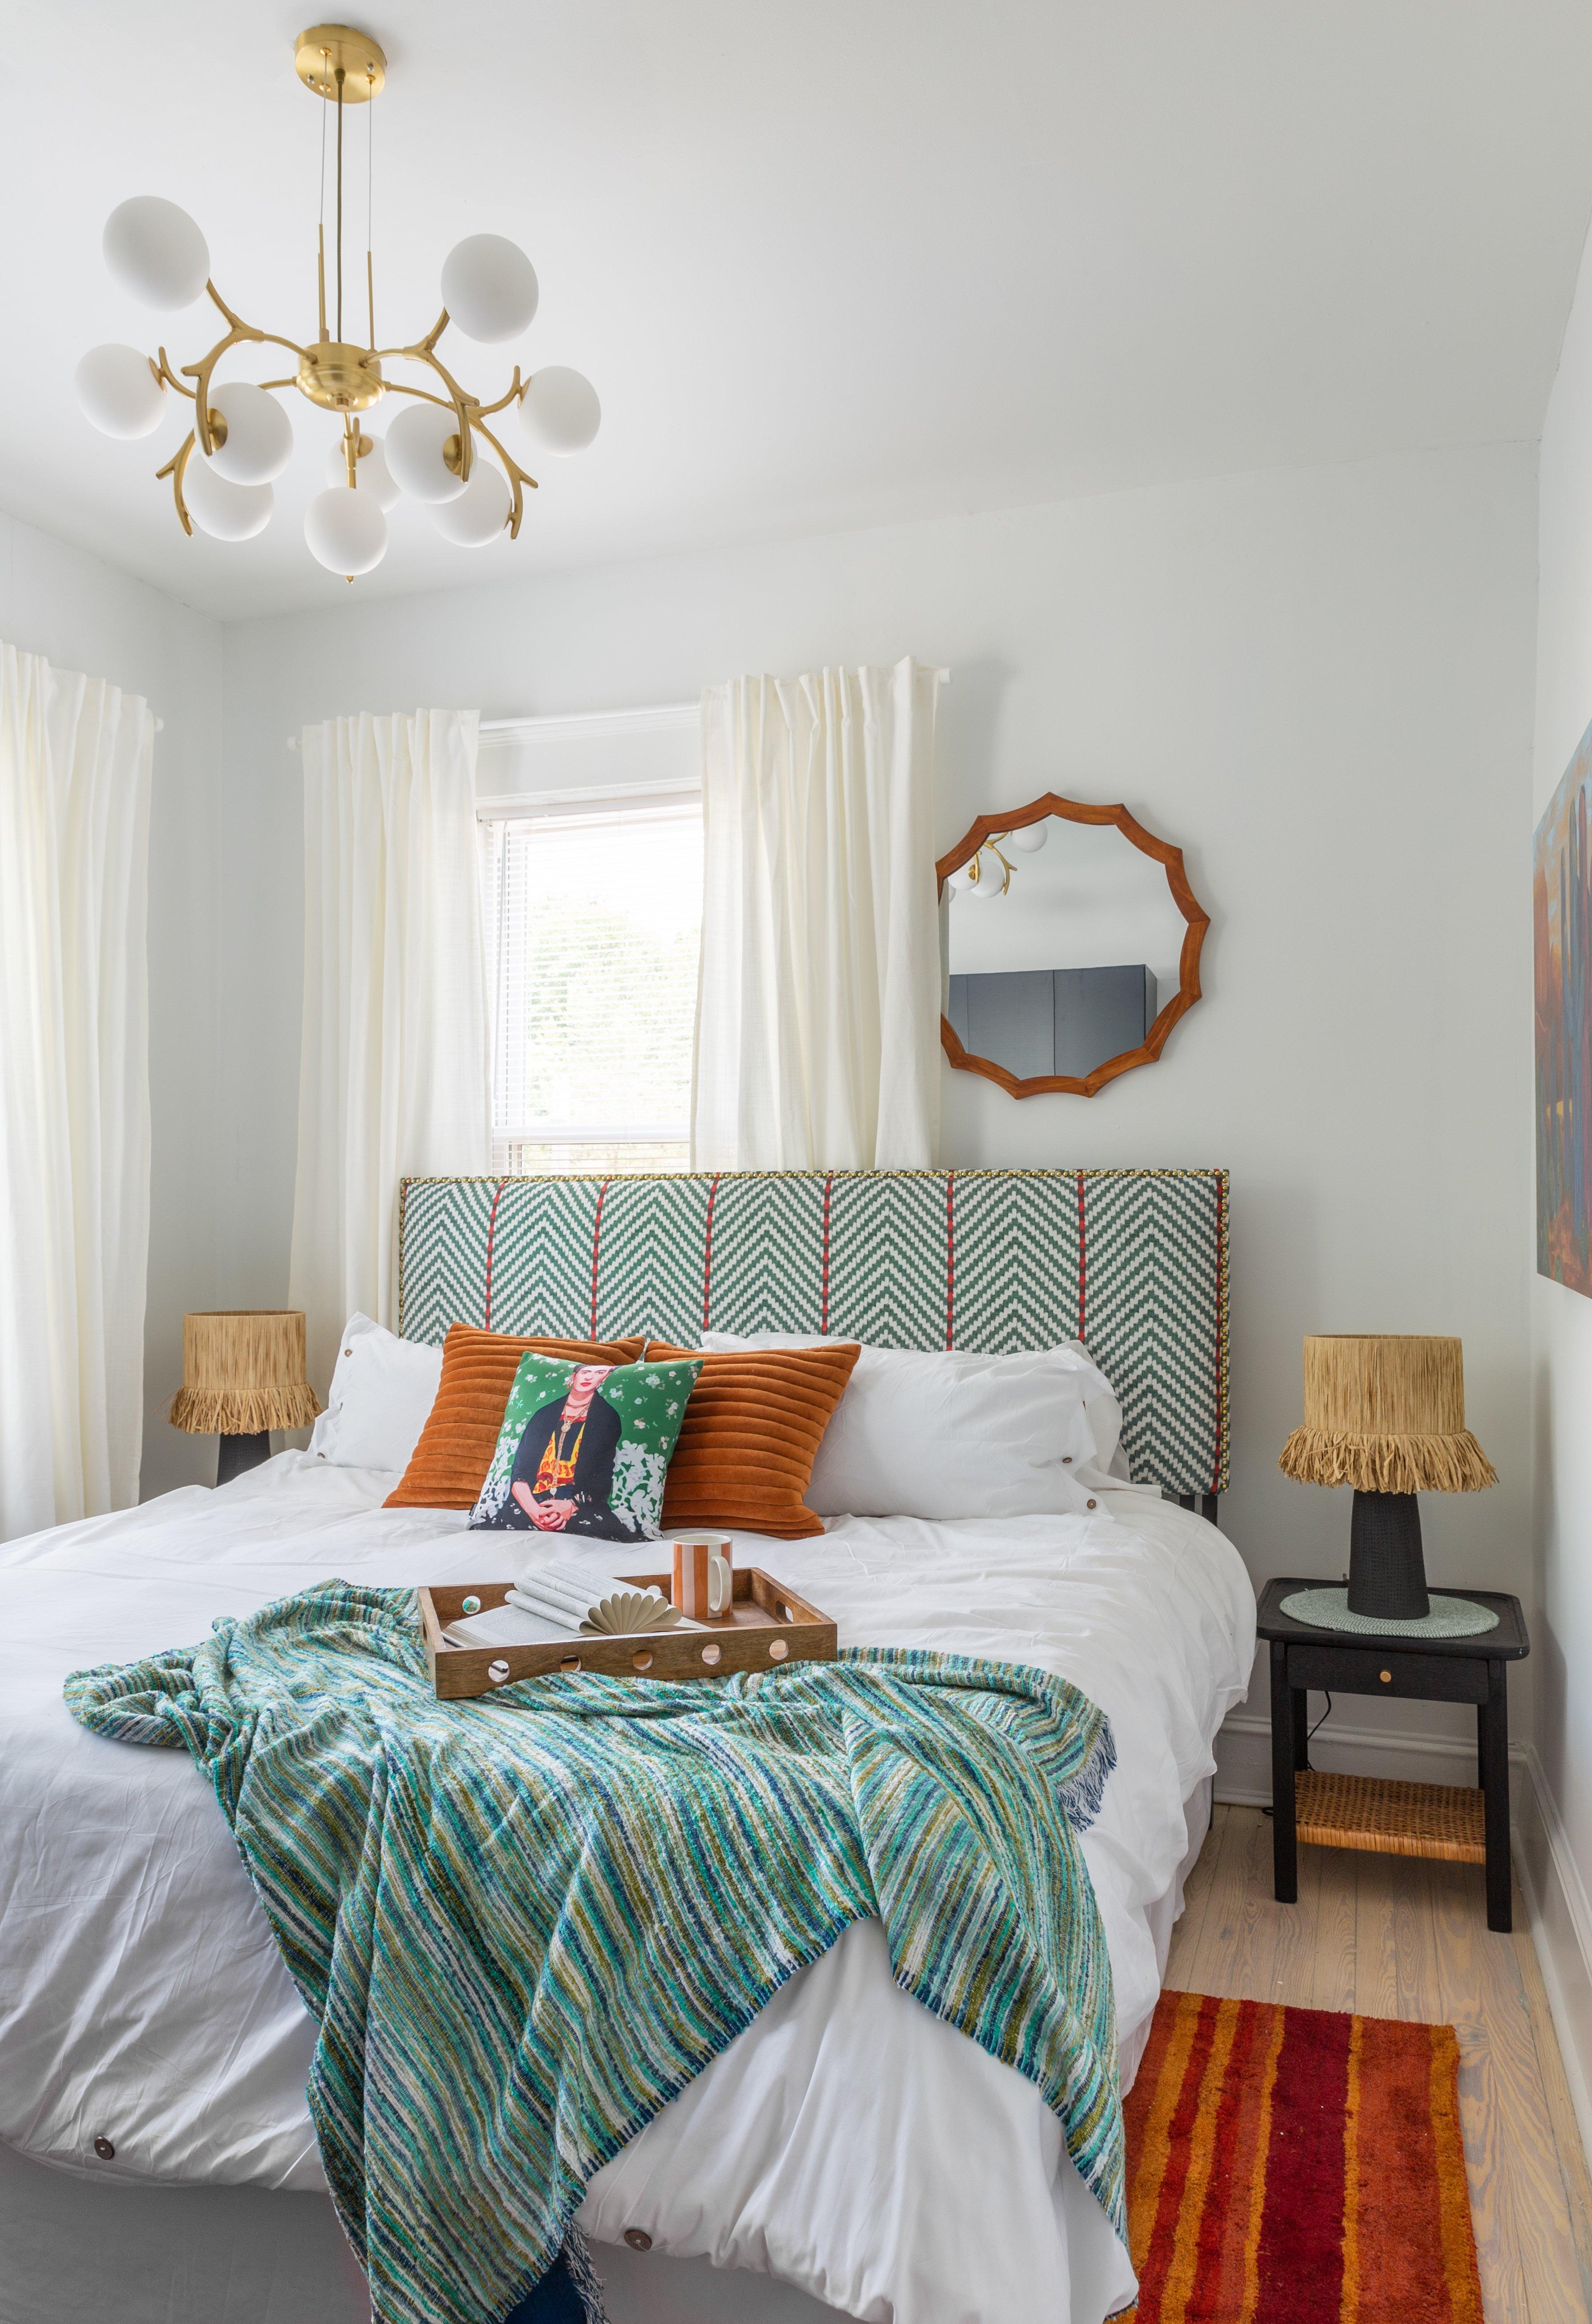 28 bedroom 1 untitledswim-meet-2-90-HDR.jpg